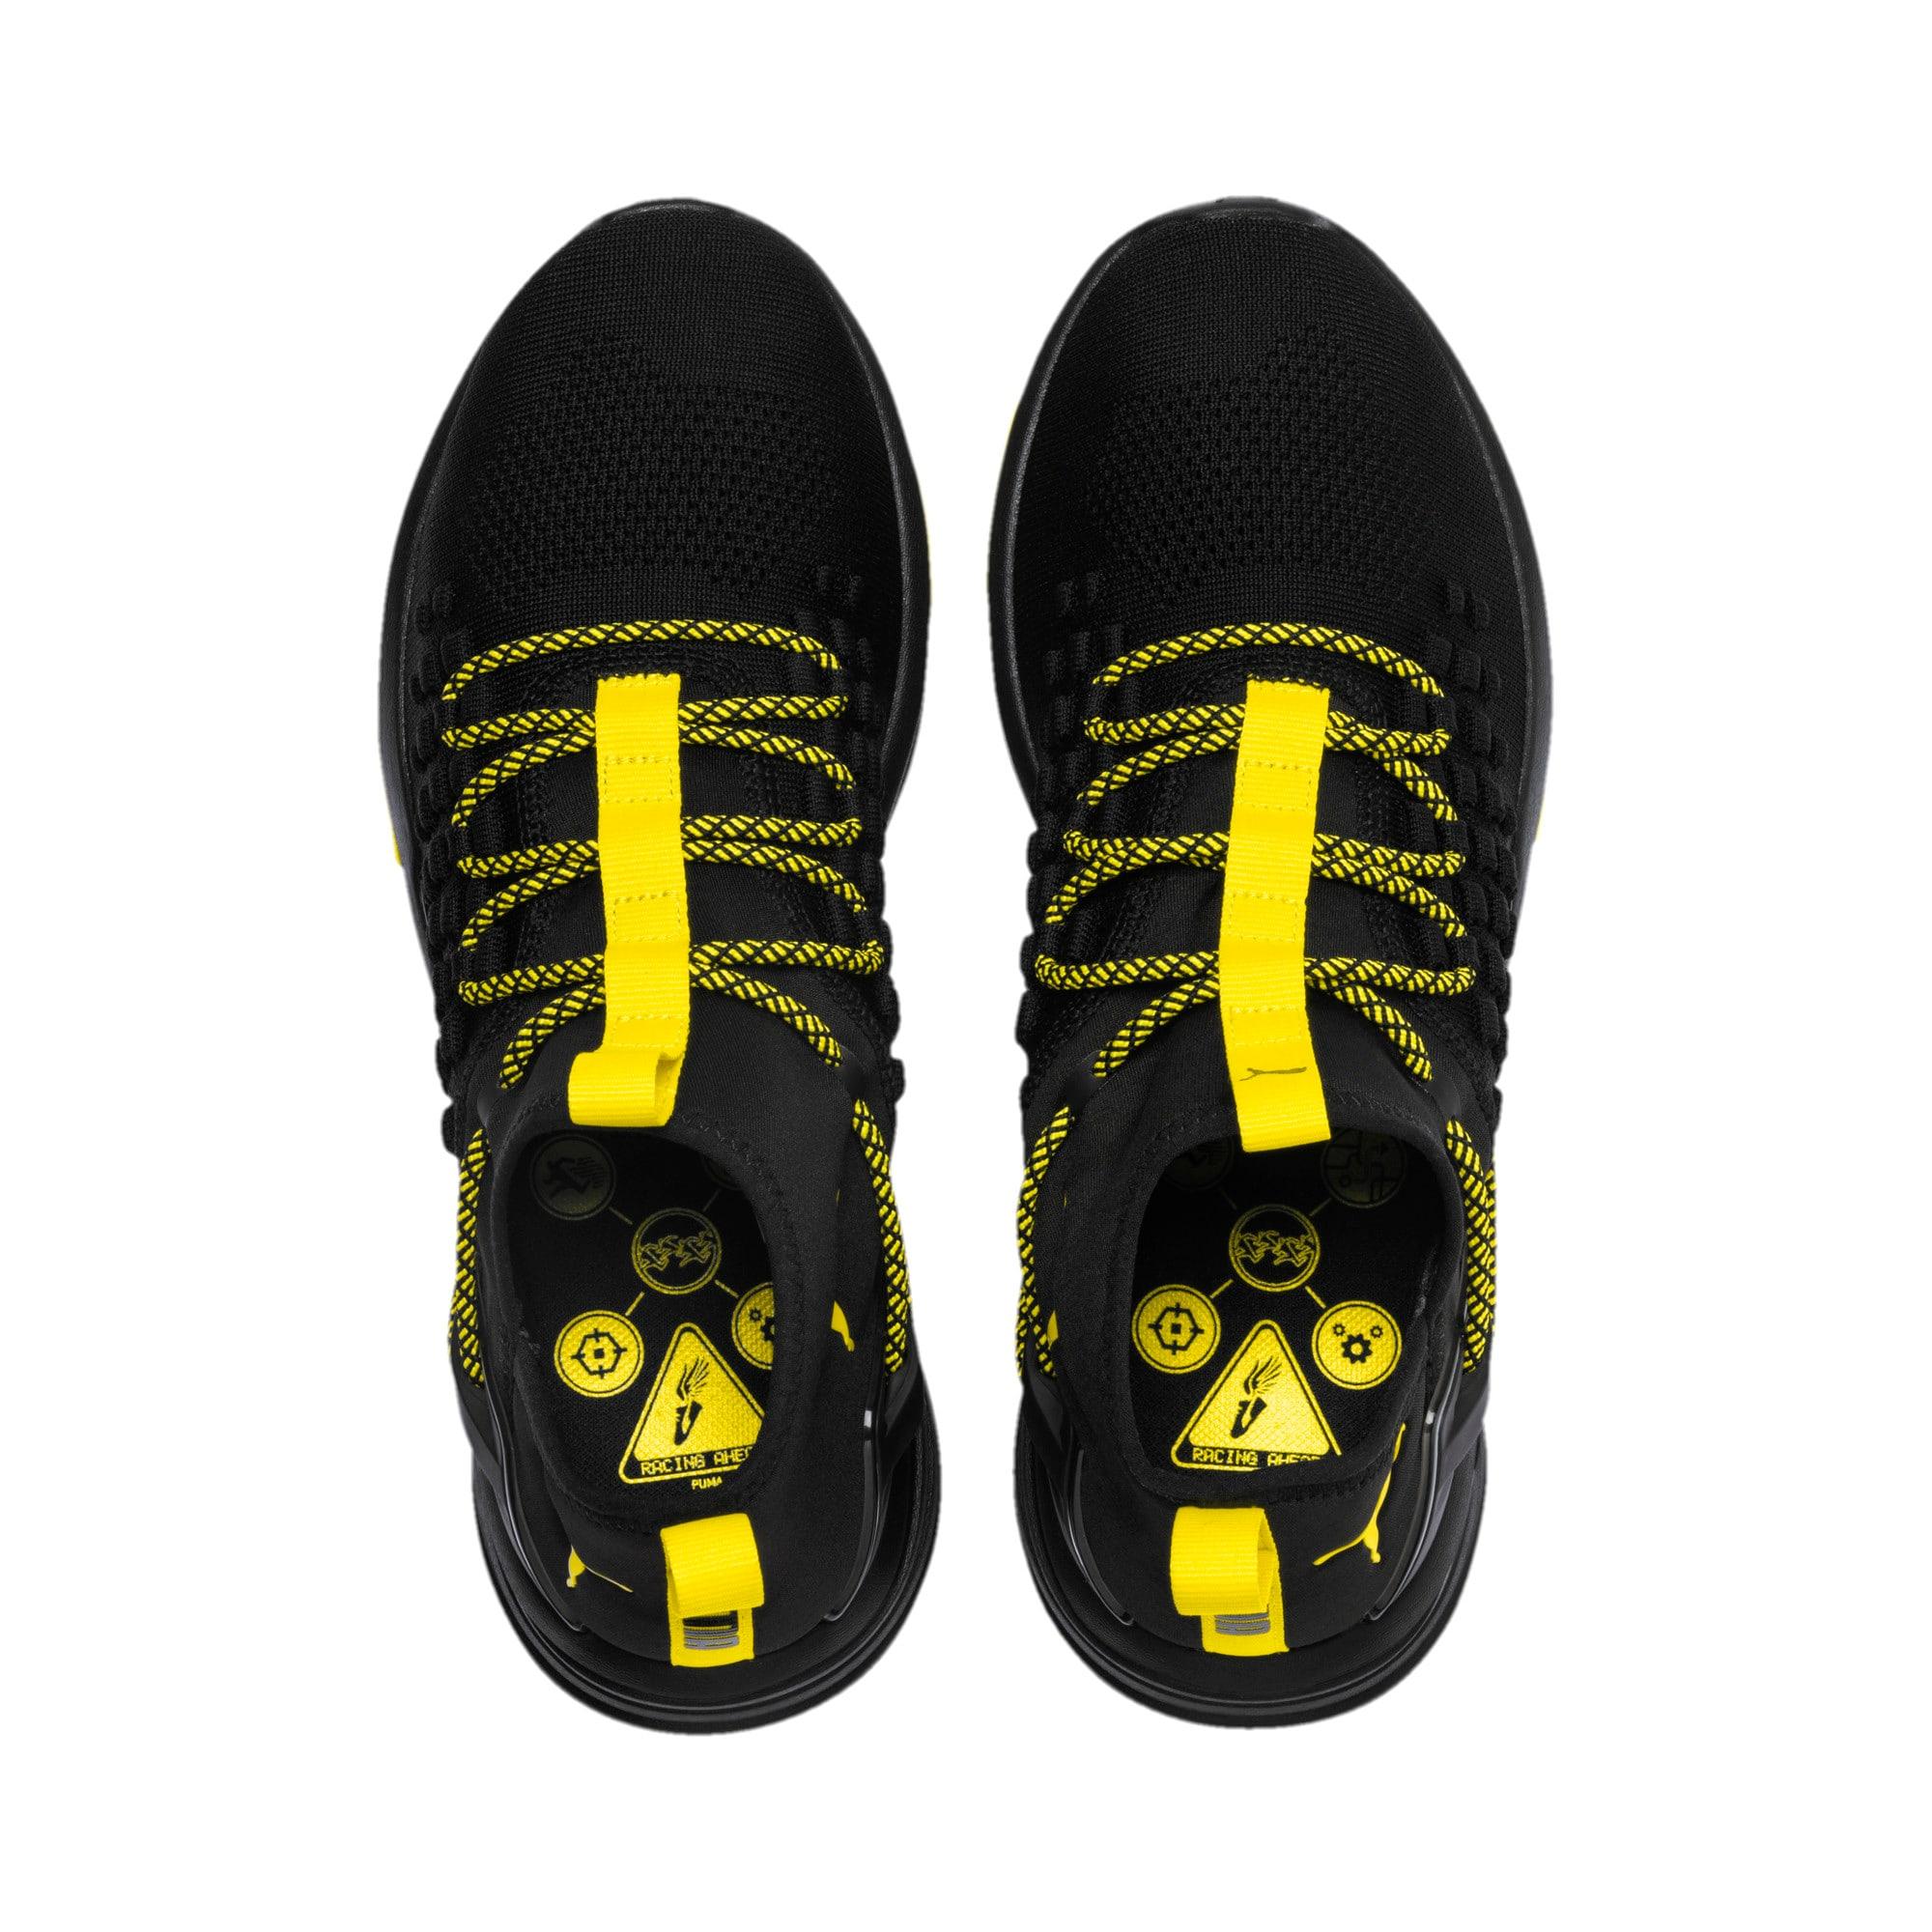 Thumbnail 6 of Mantra Caution Herren Trainingsschuhe, Puma Black-Blazing Yellow, medium